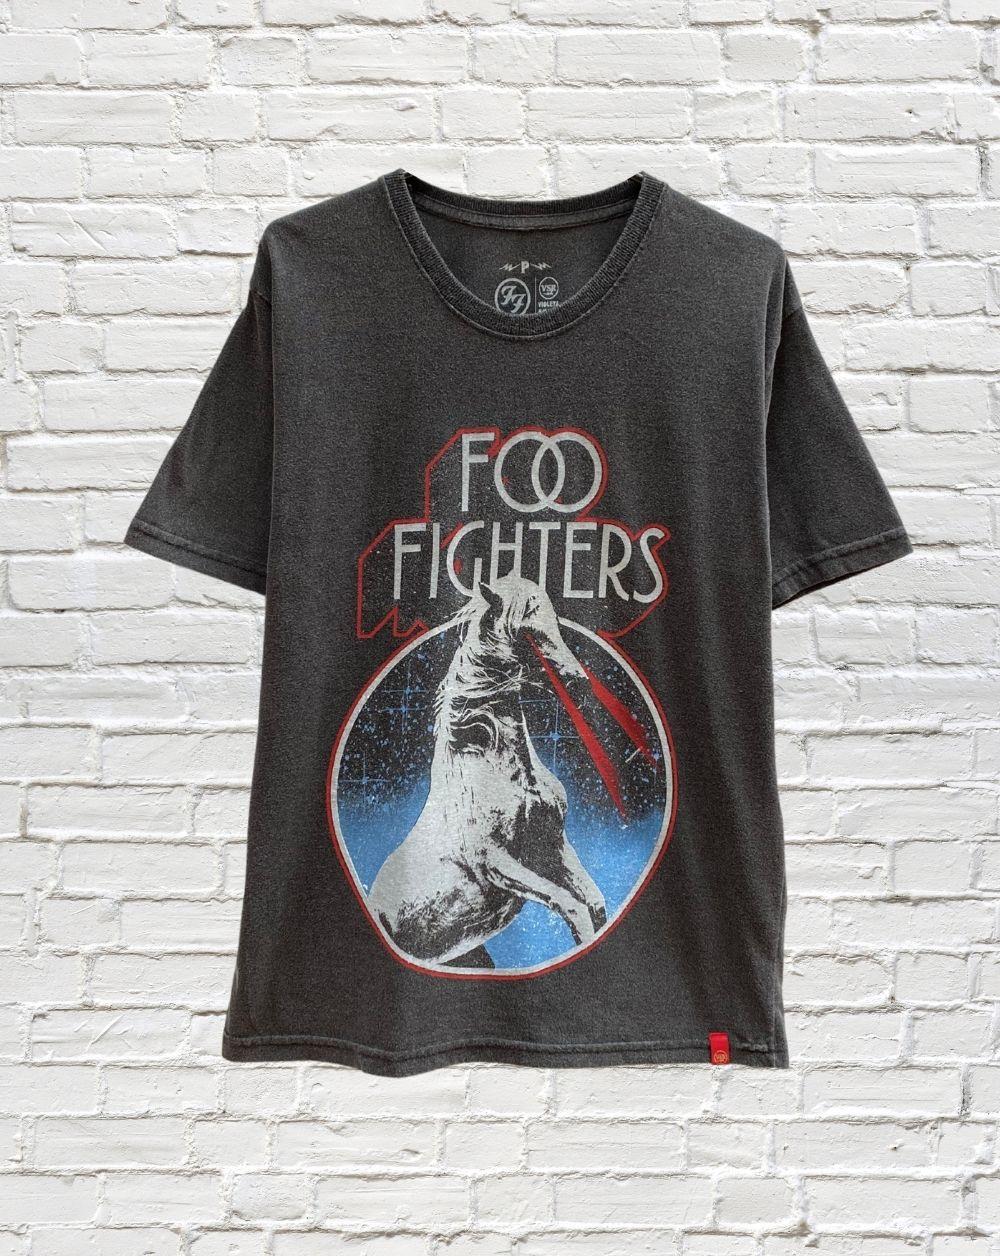 Camiseta Foo Fighters Horse